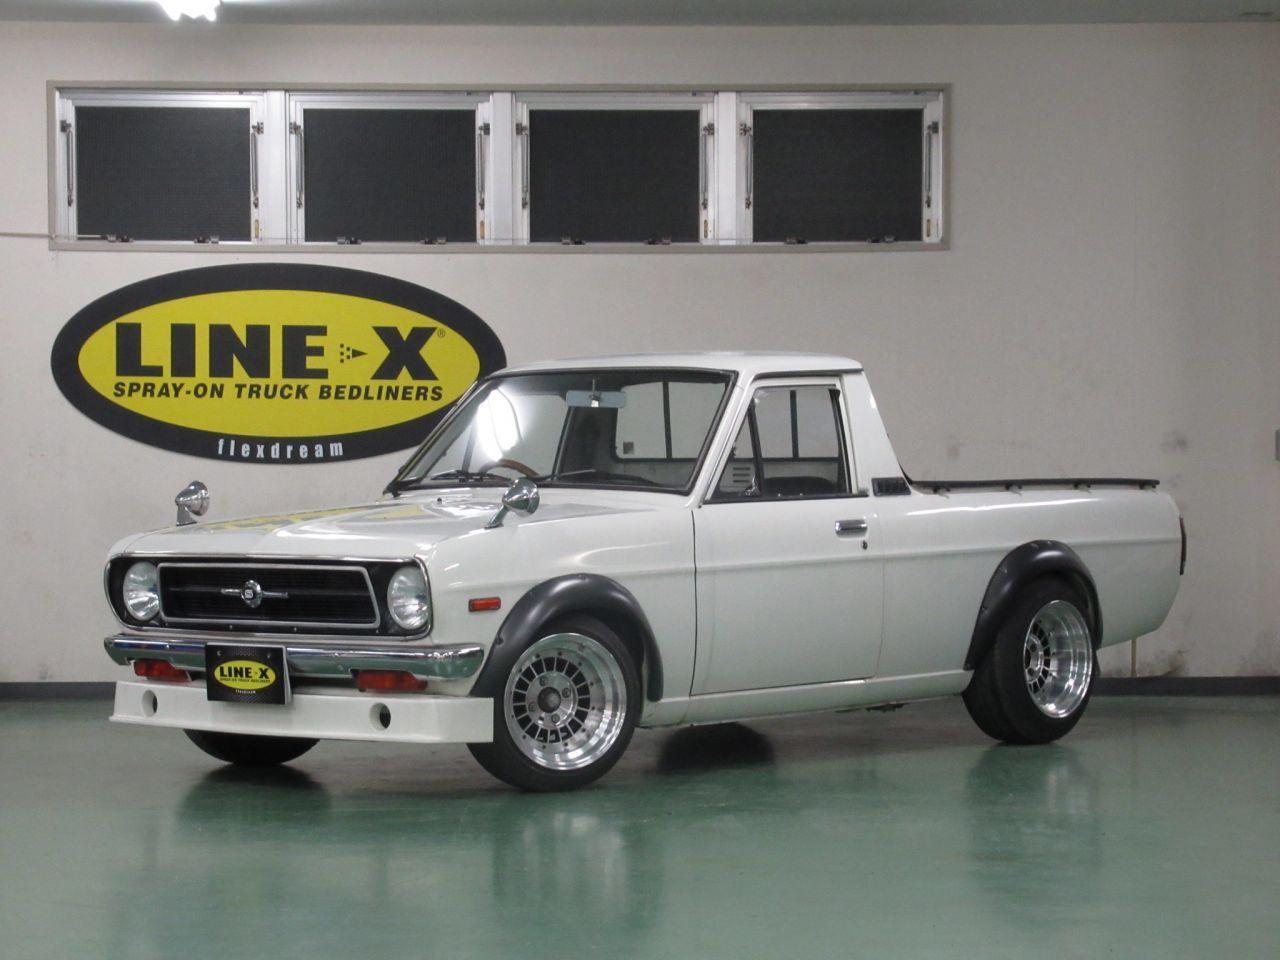 Datsun 1200 bakkie pick up | nissan champ